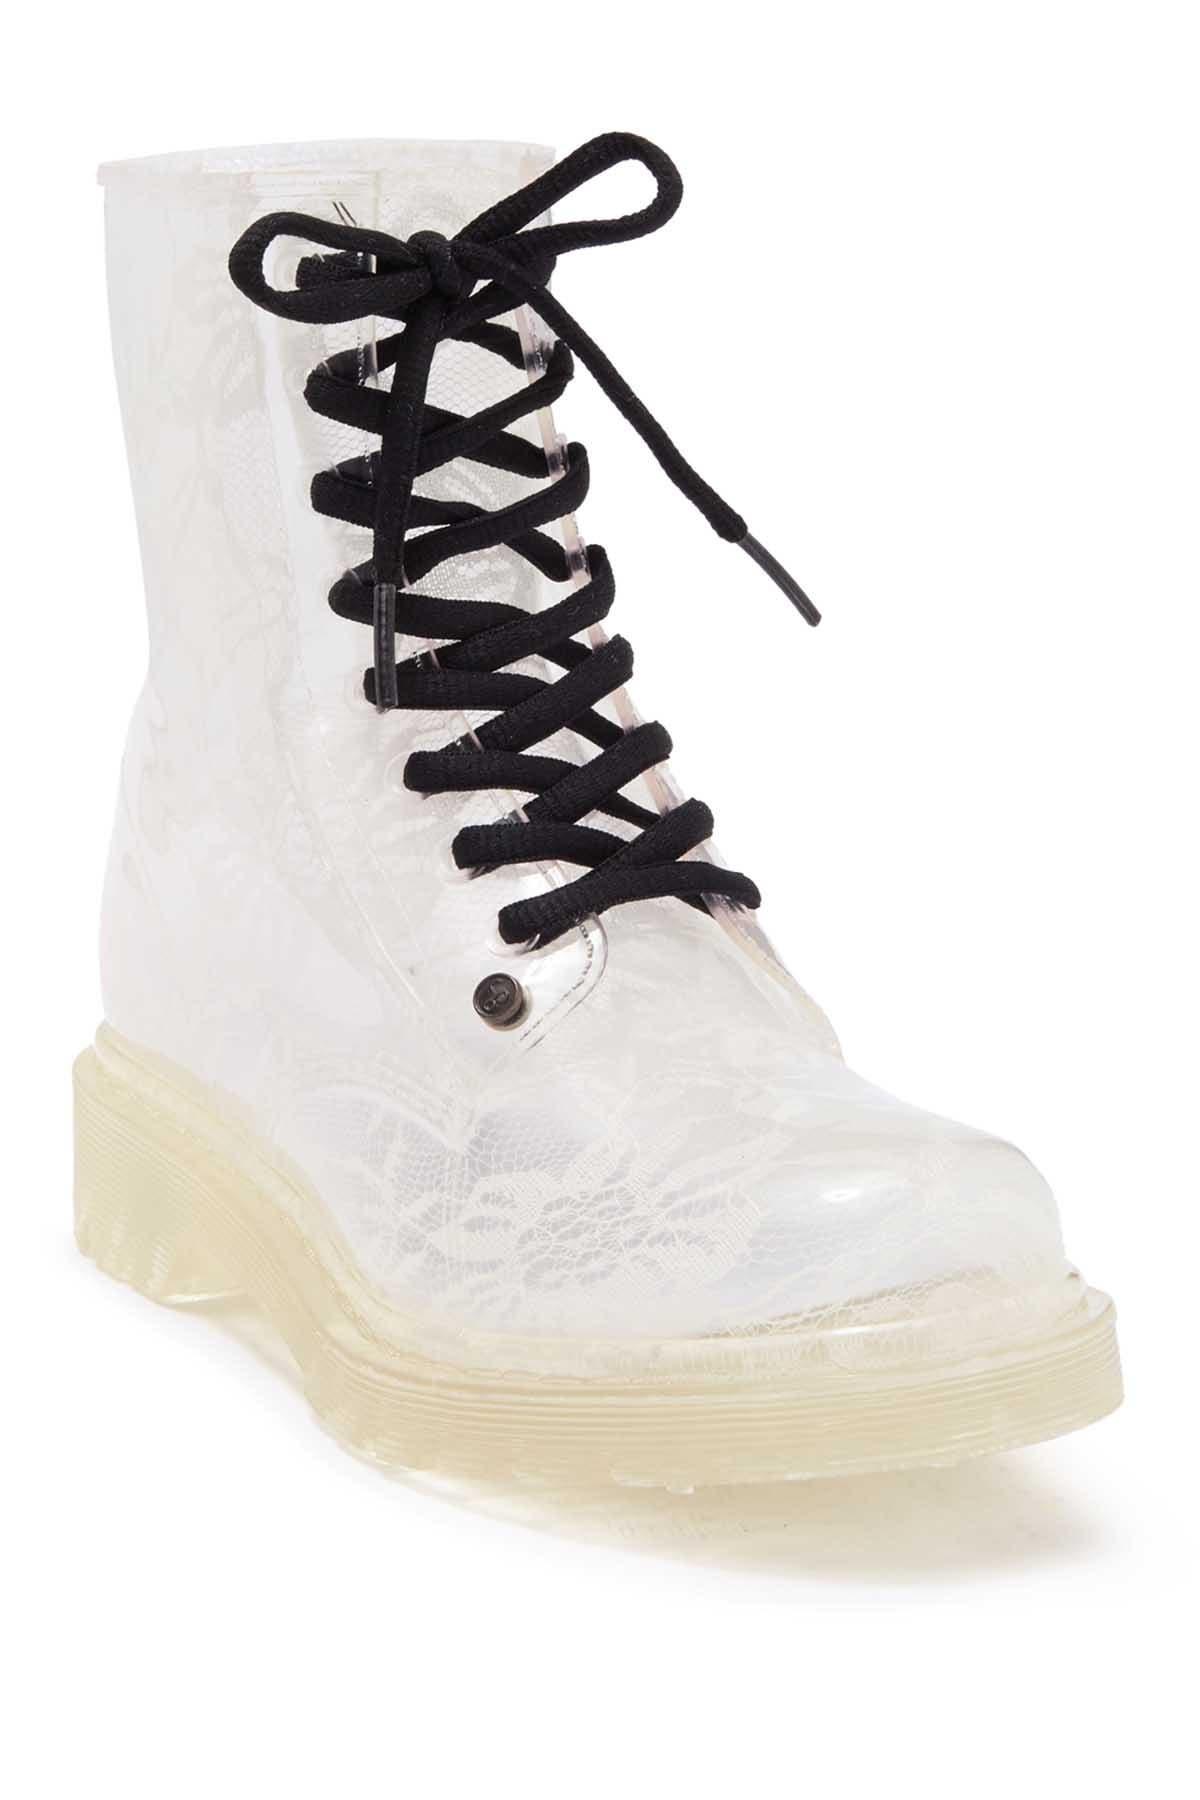 Image of Workshop Ginny White Lace Translucent Lace Up Rainboots